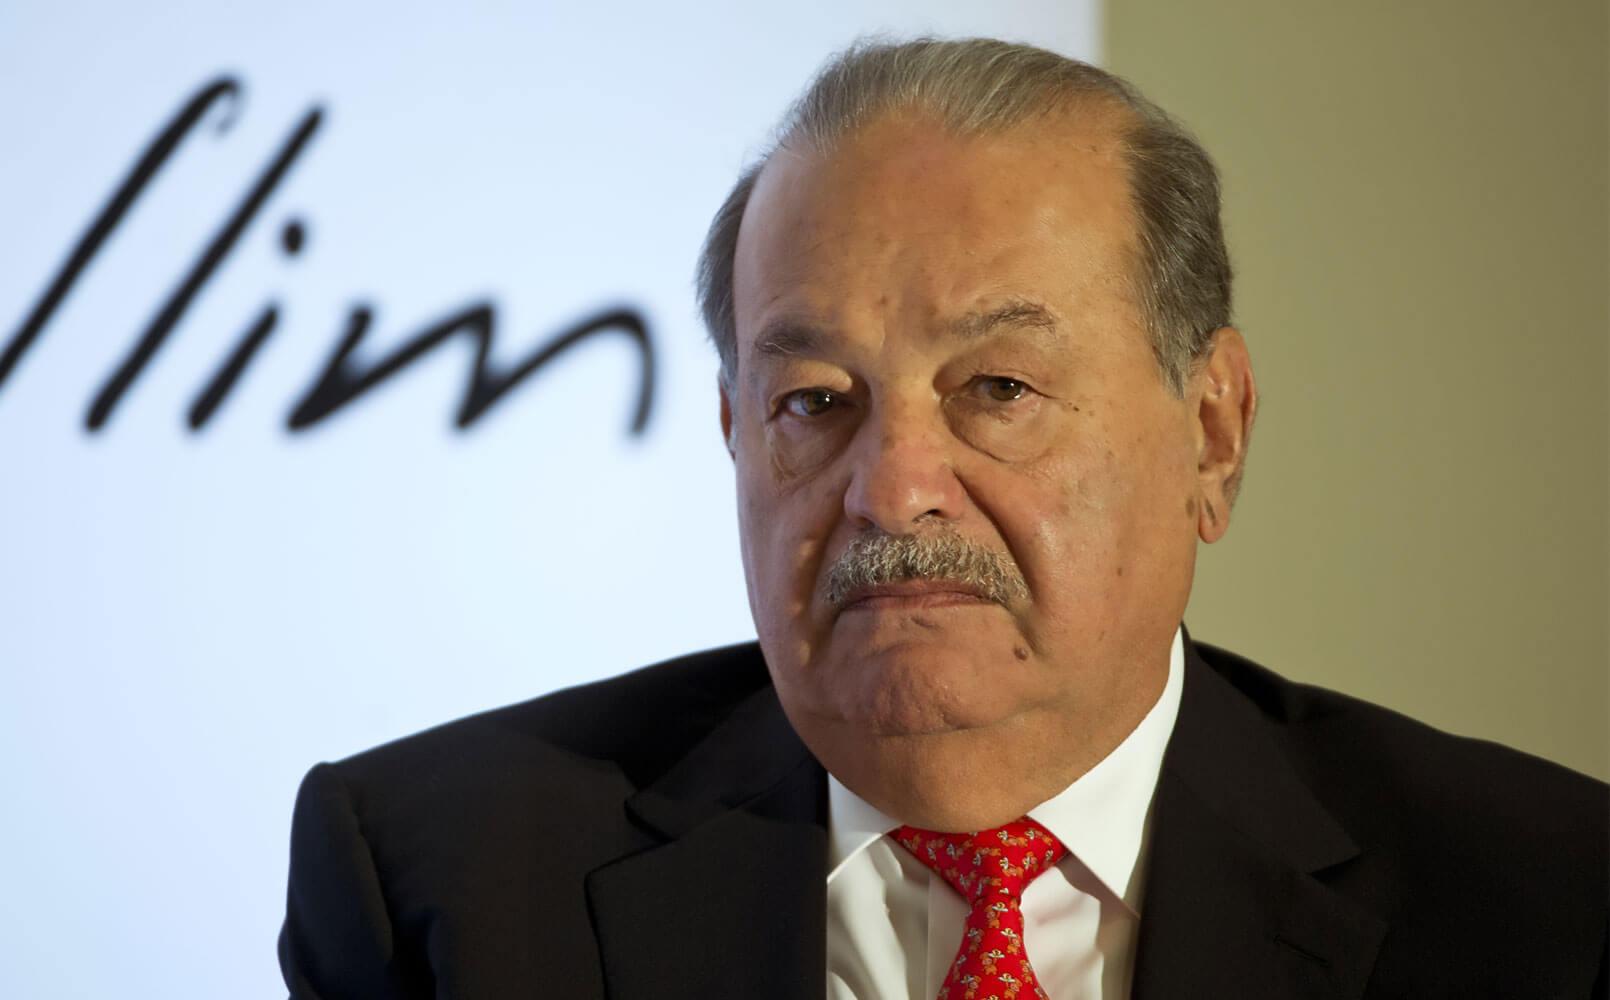 Карлос Слим Элу мексиканский миллиардер